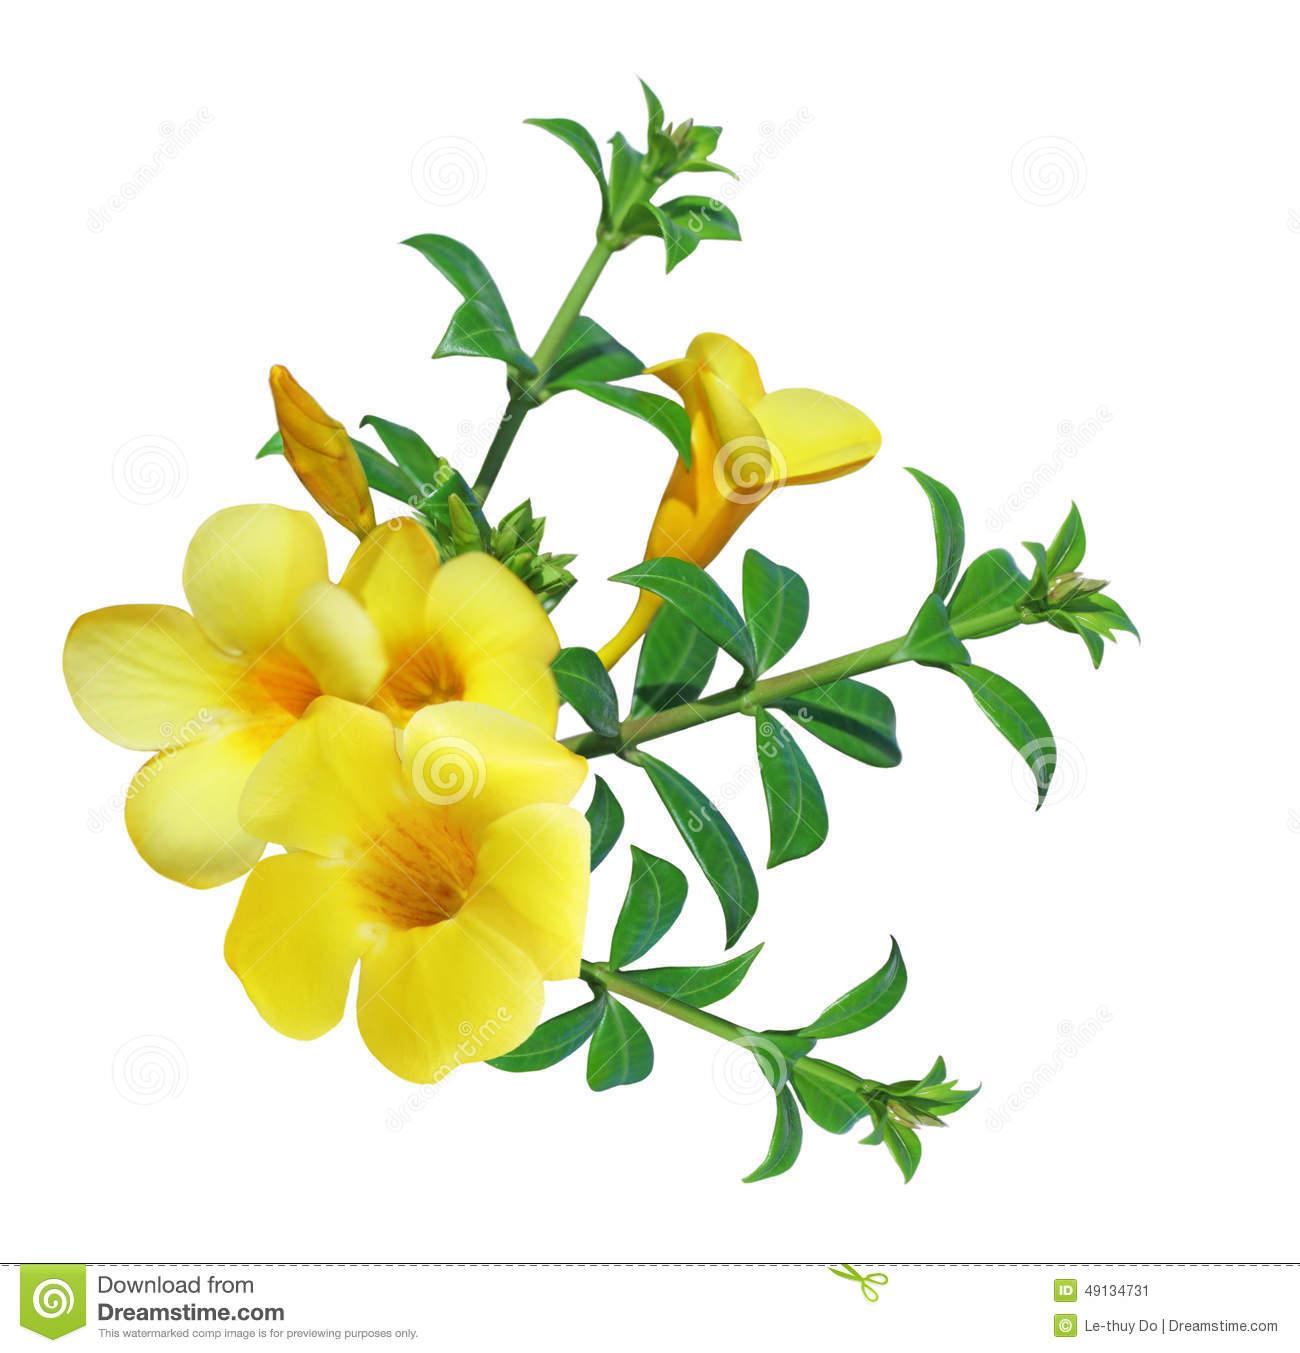 Allamanda Flower Stock Photos, Images, & Pictures.